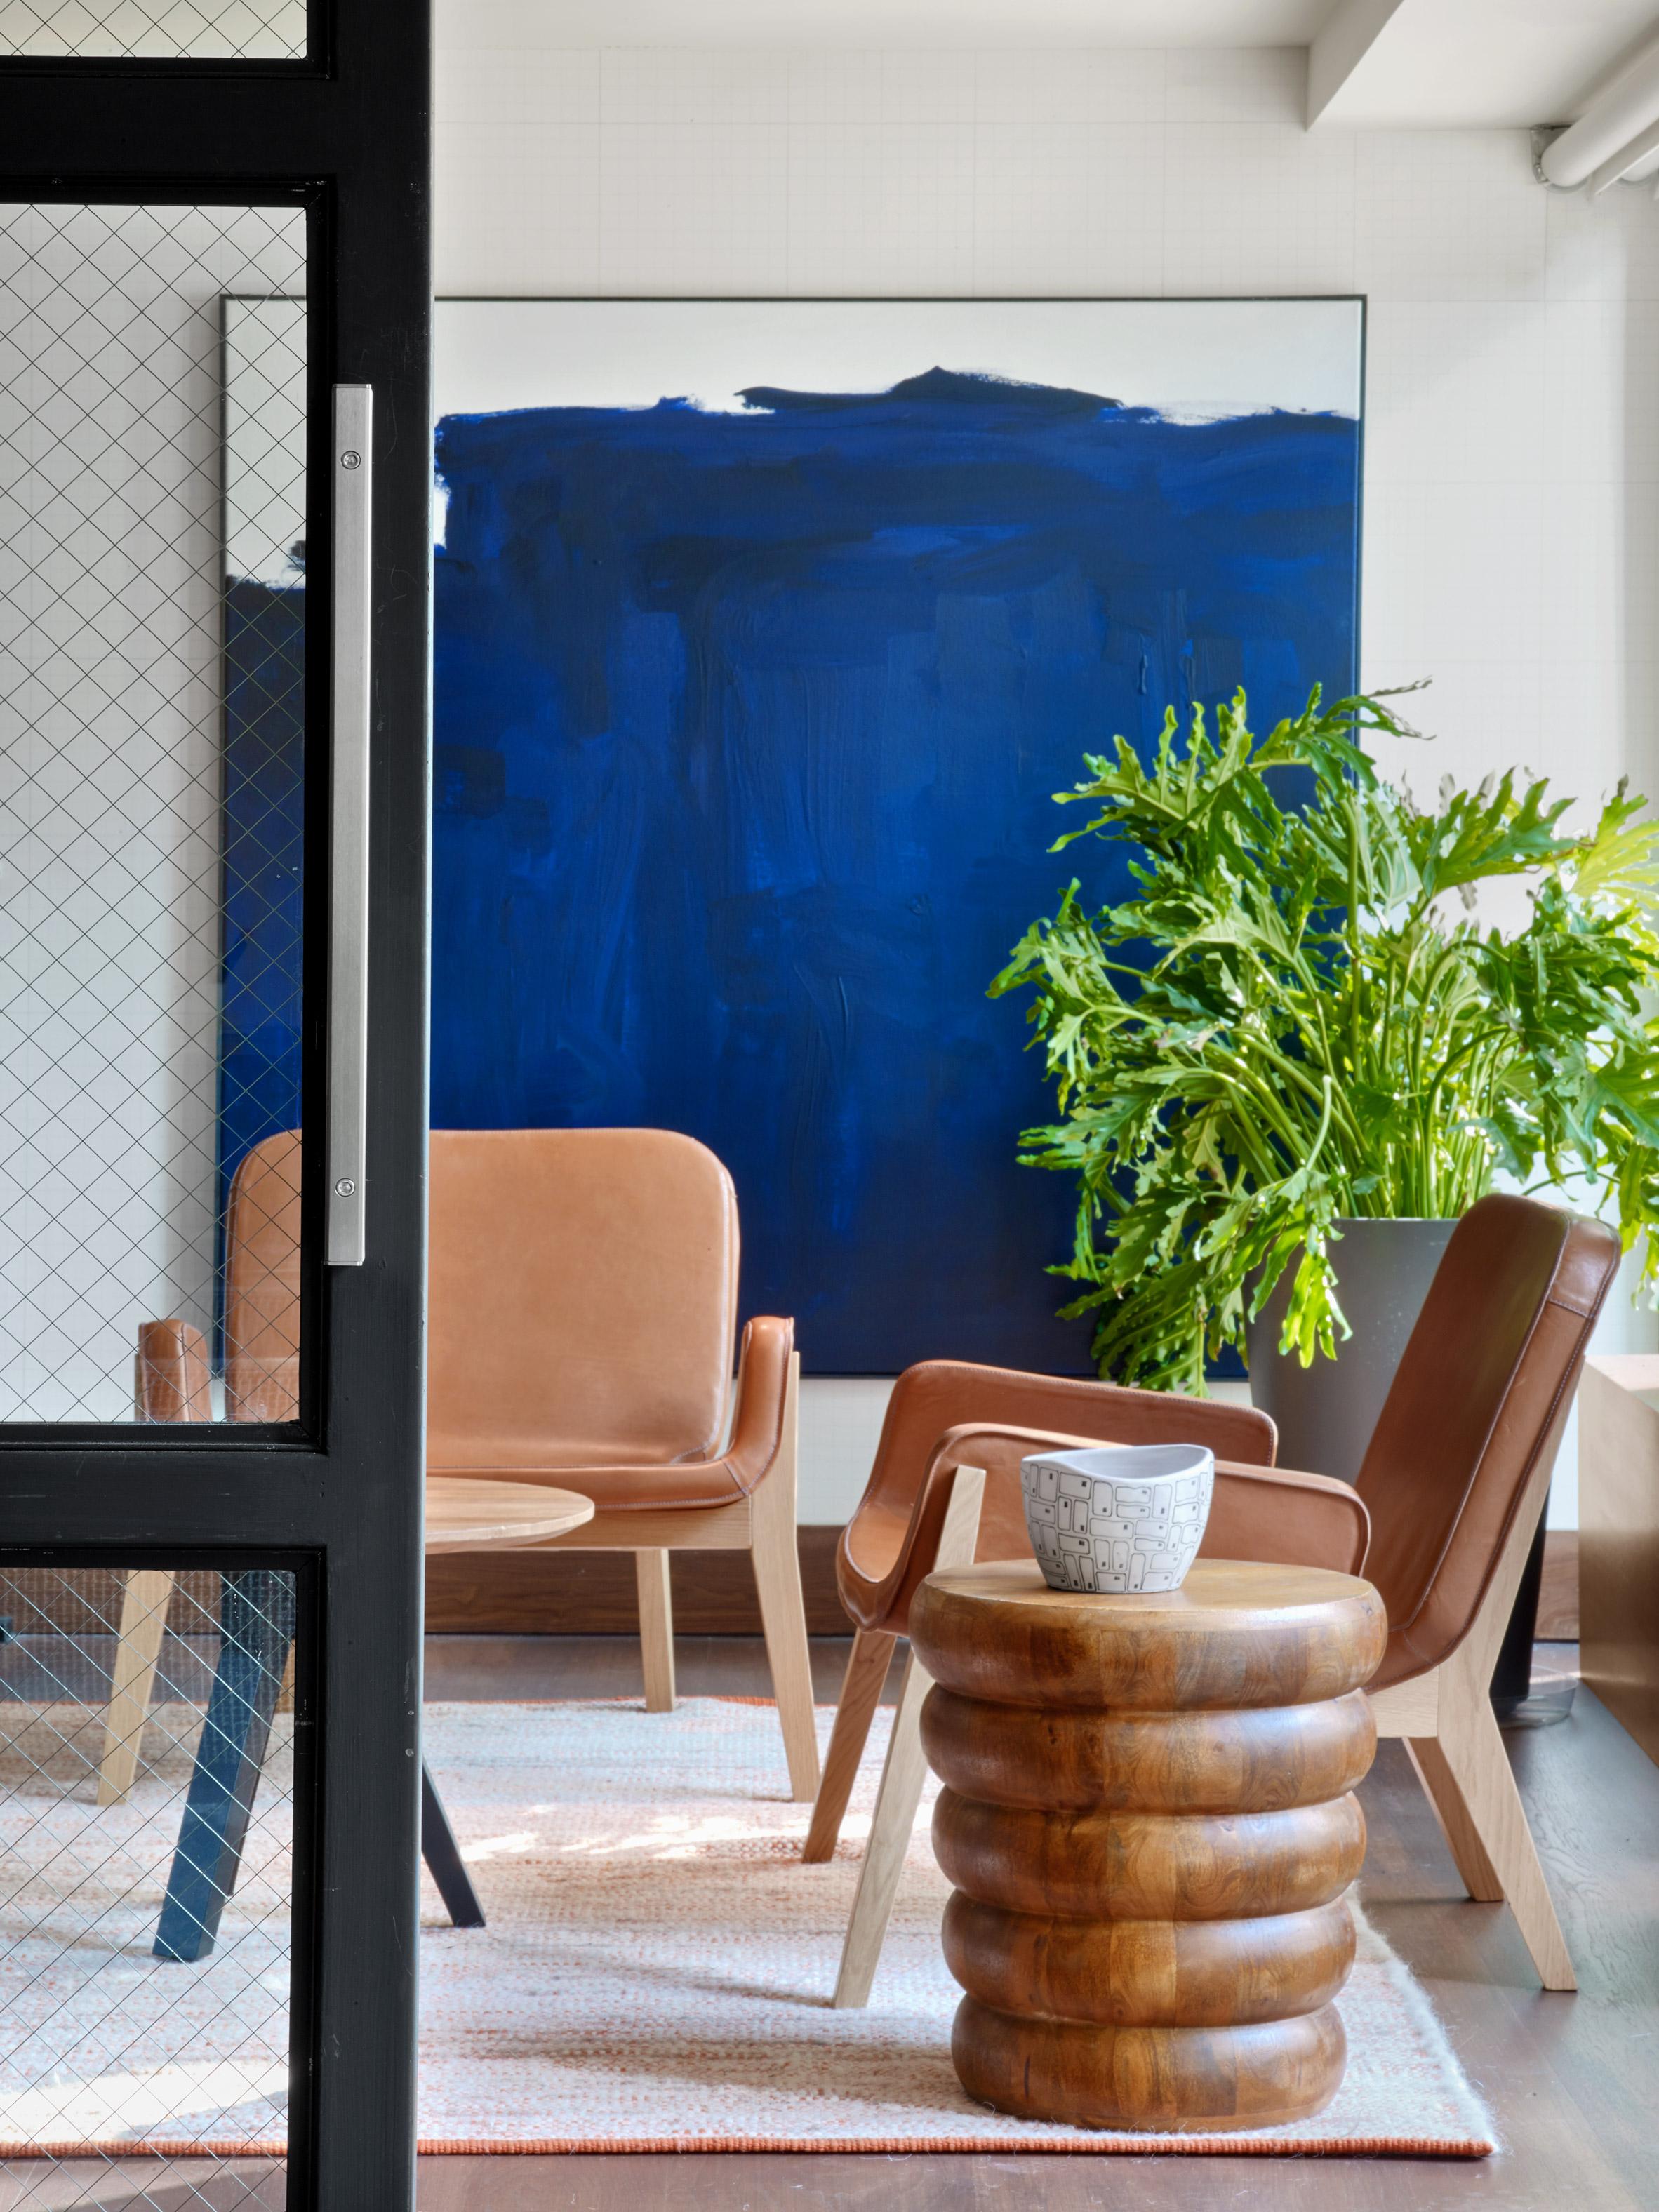 architecture-new-york-city-micro-hotel-design-studia-interiors-osnovadesign-osnova-poltava_05